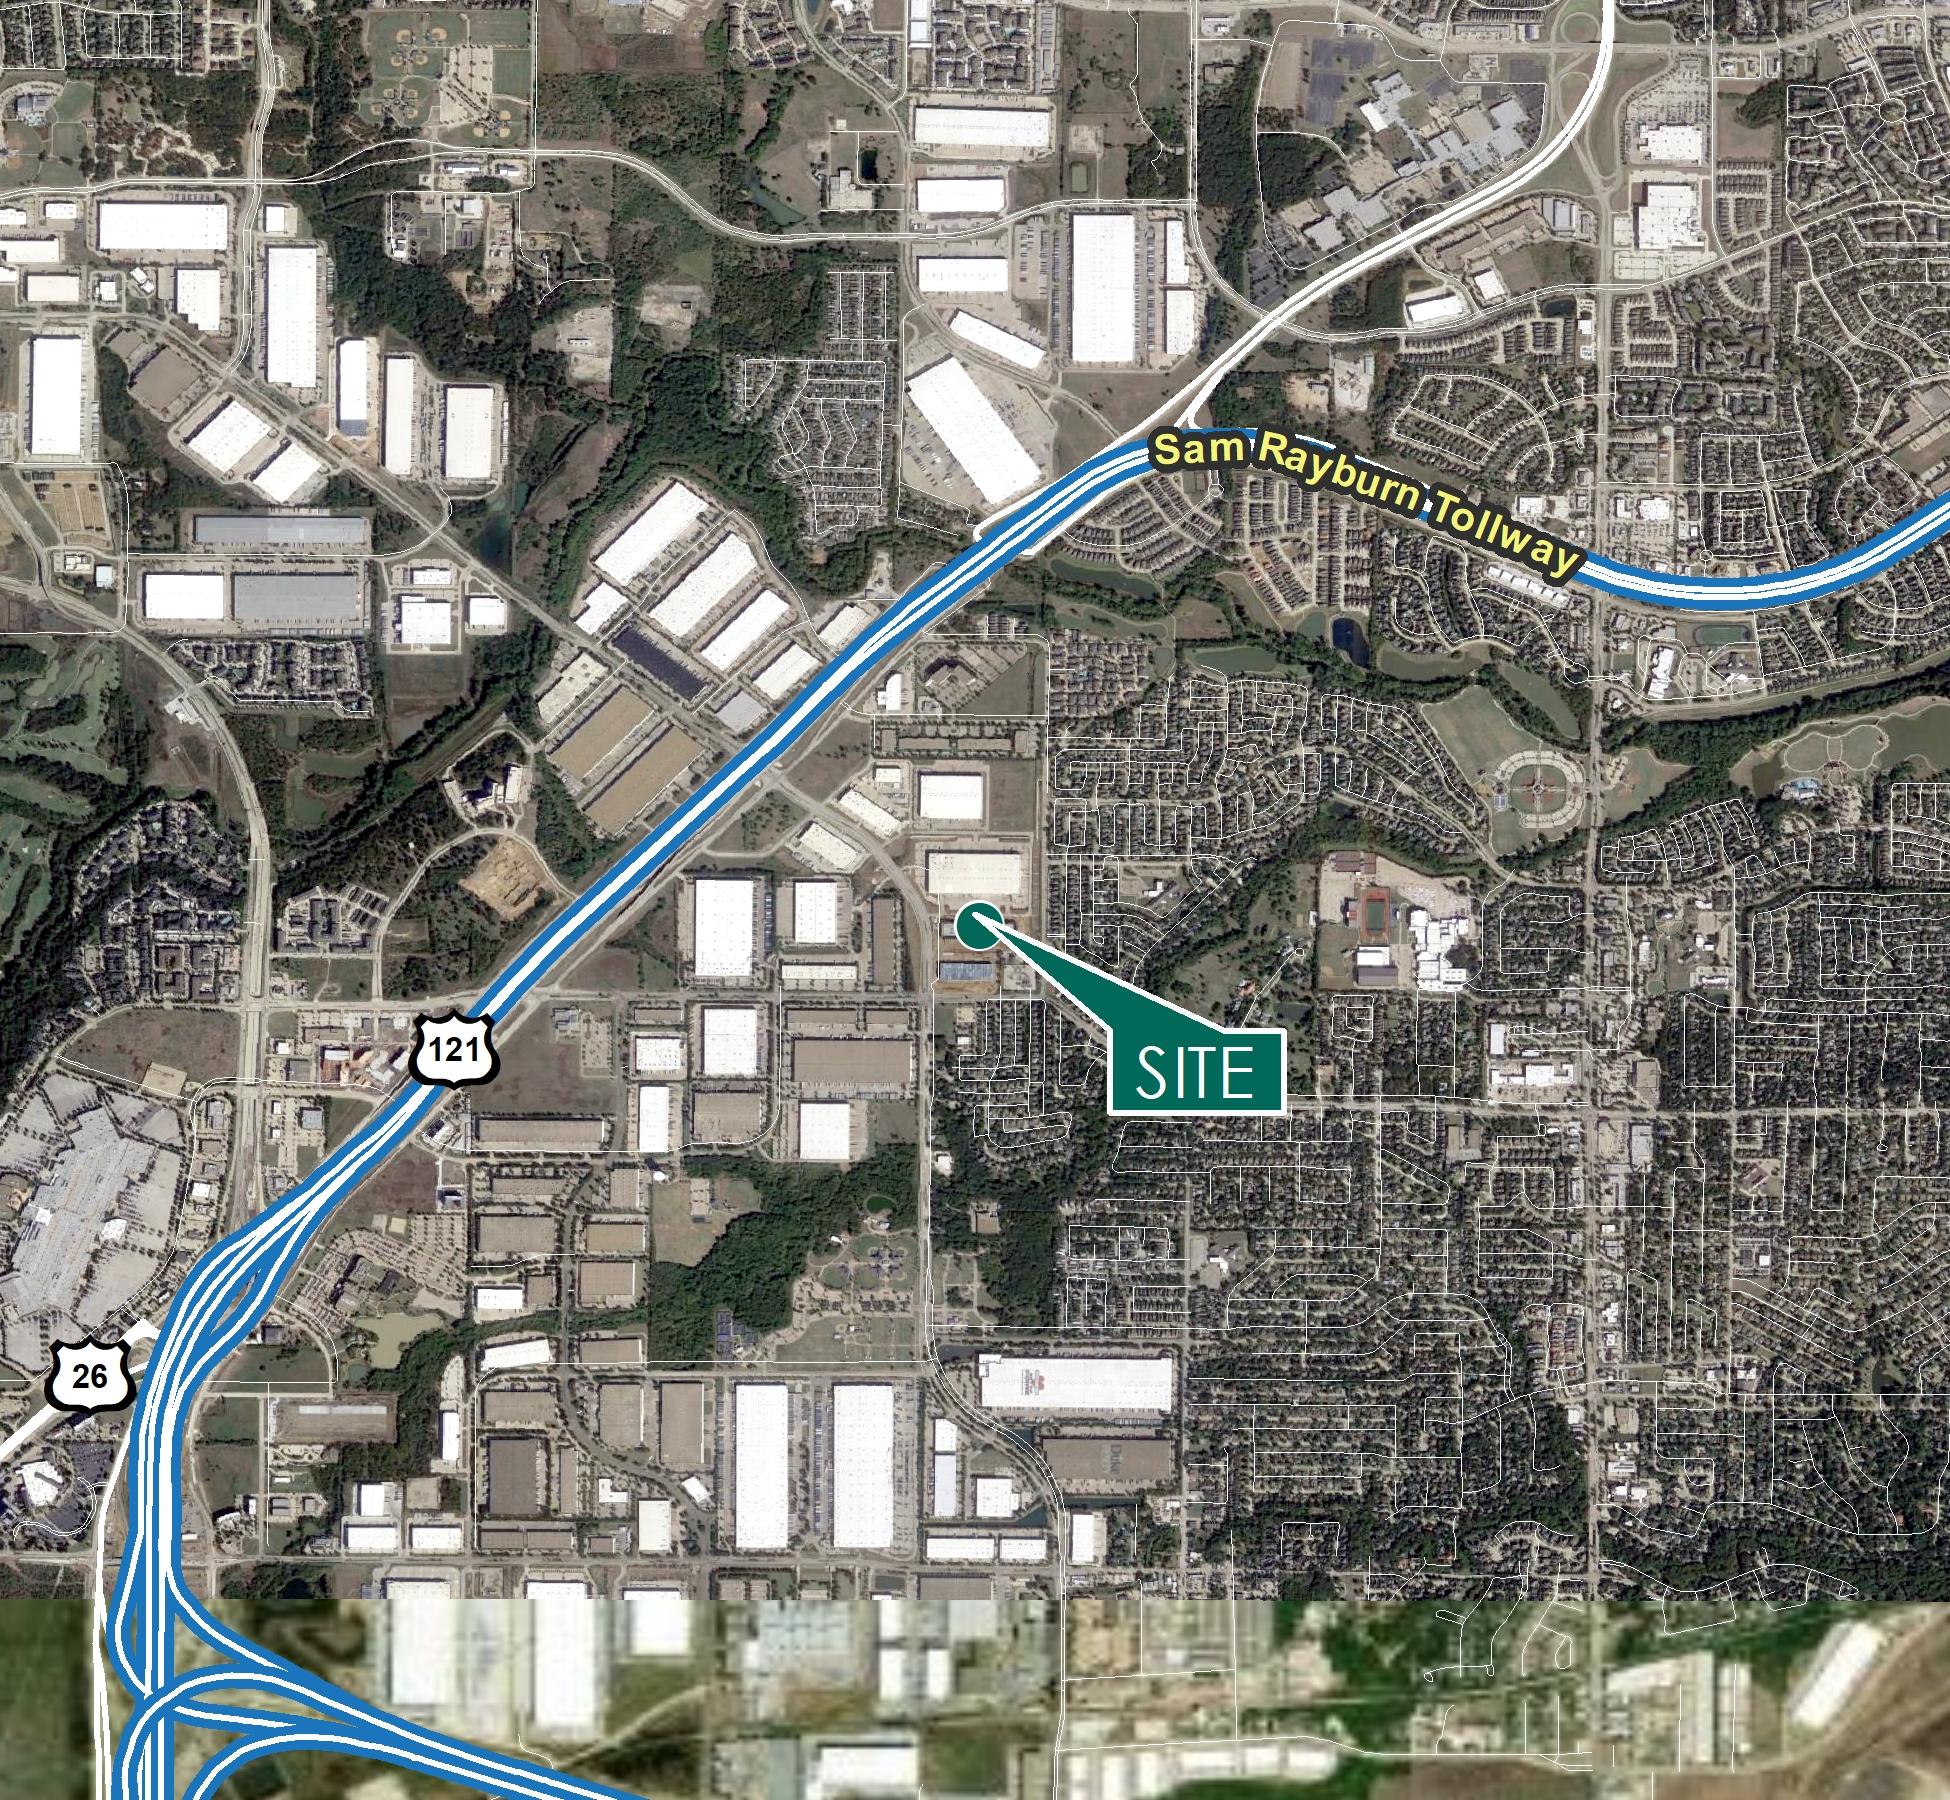 Prologis-Park-121-Bldg-2-DAL05402-180-N-Freeport-Parkway_AerialMap.jpg